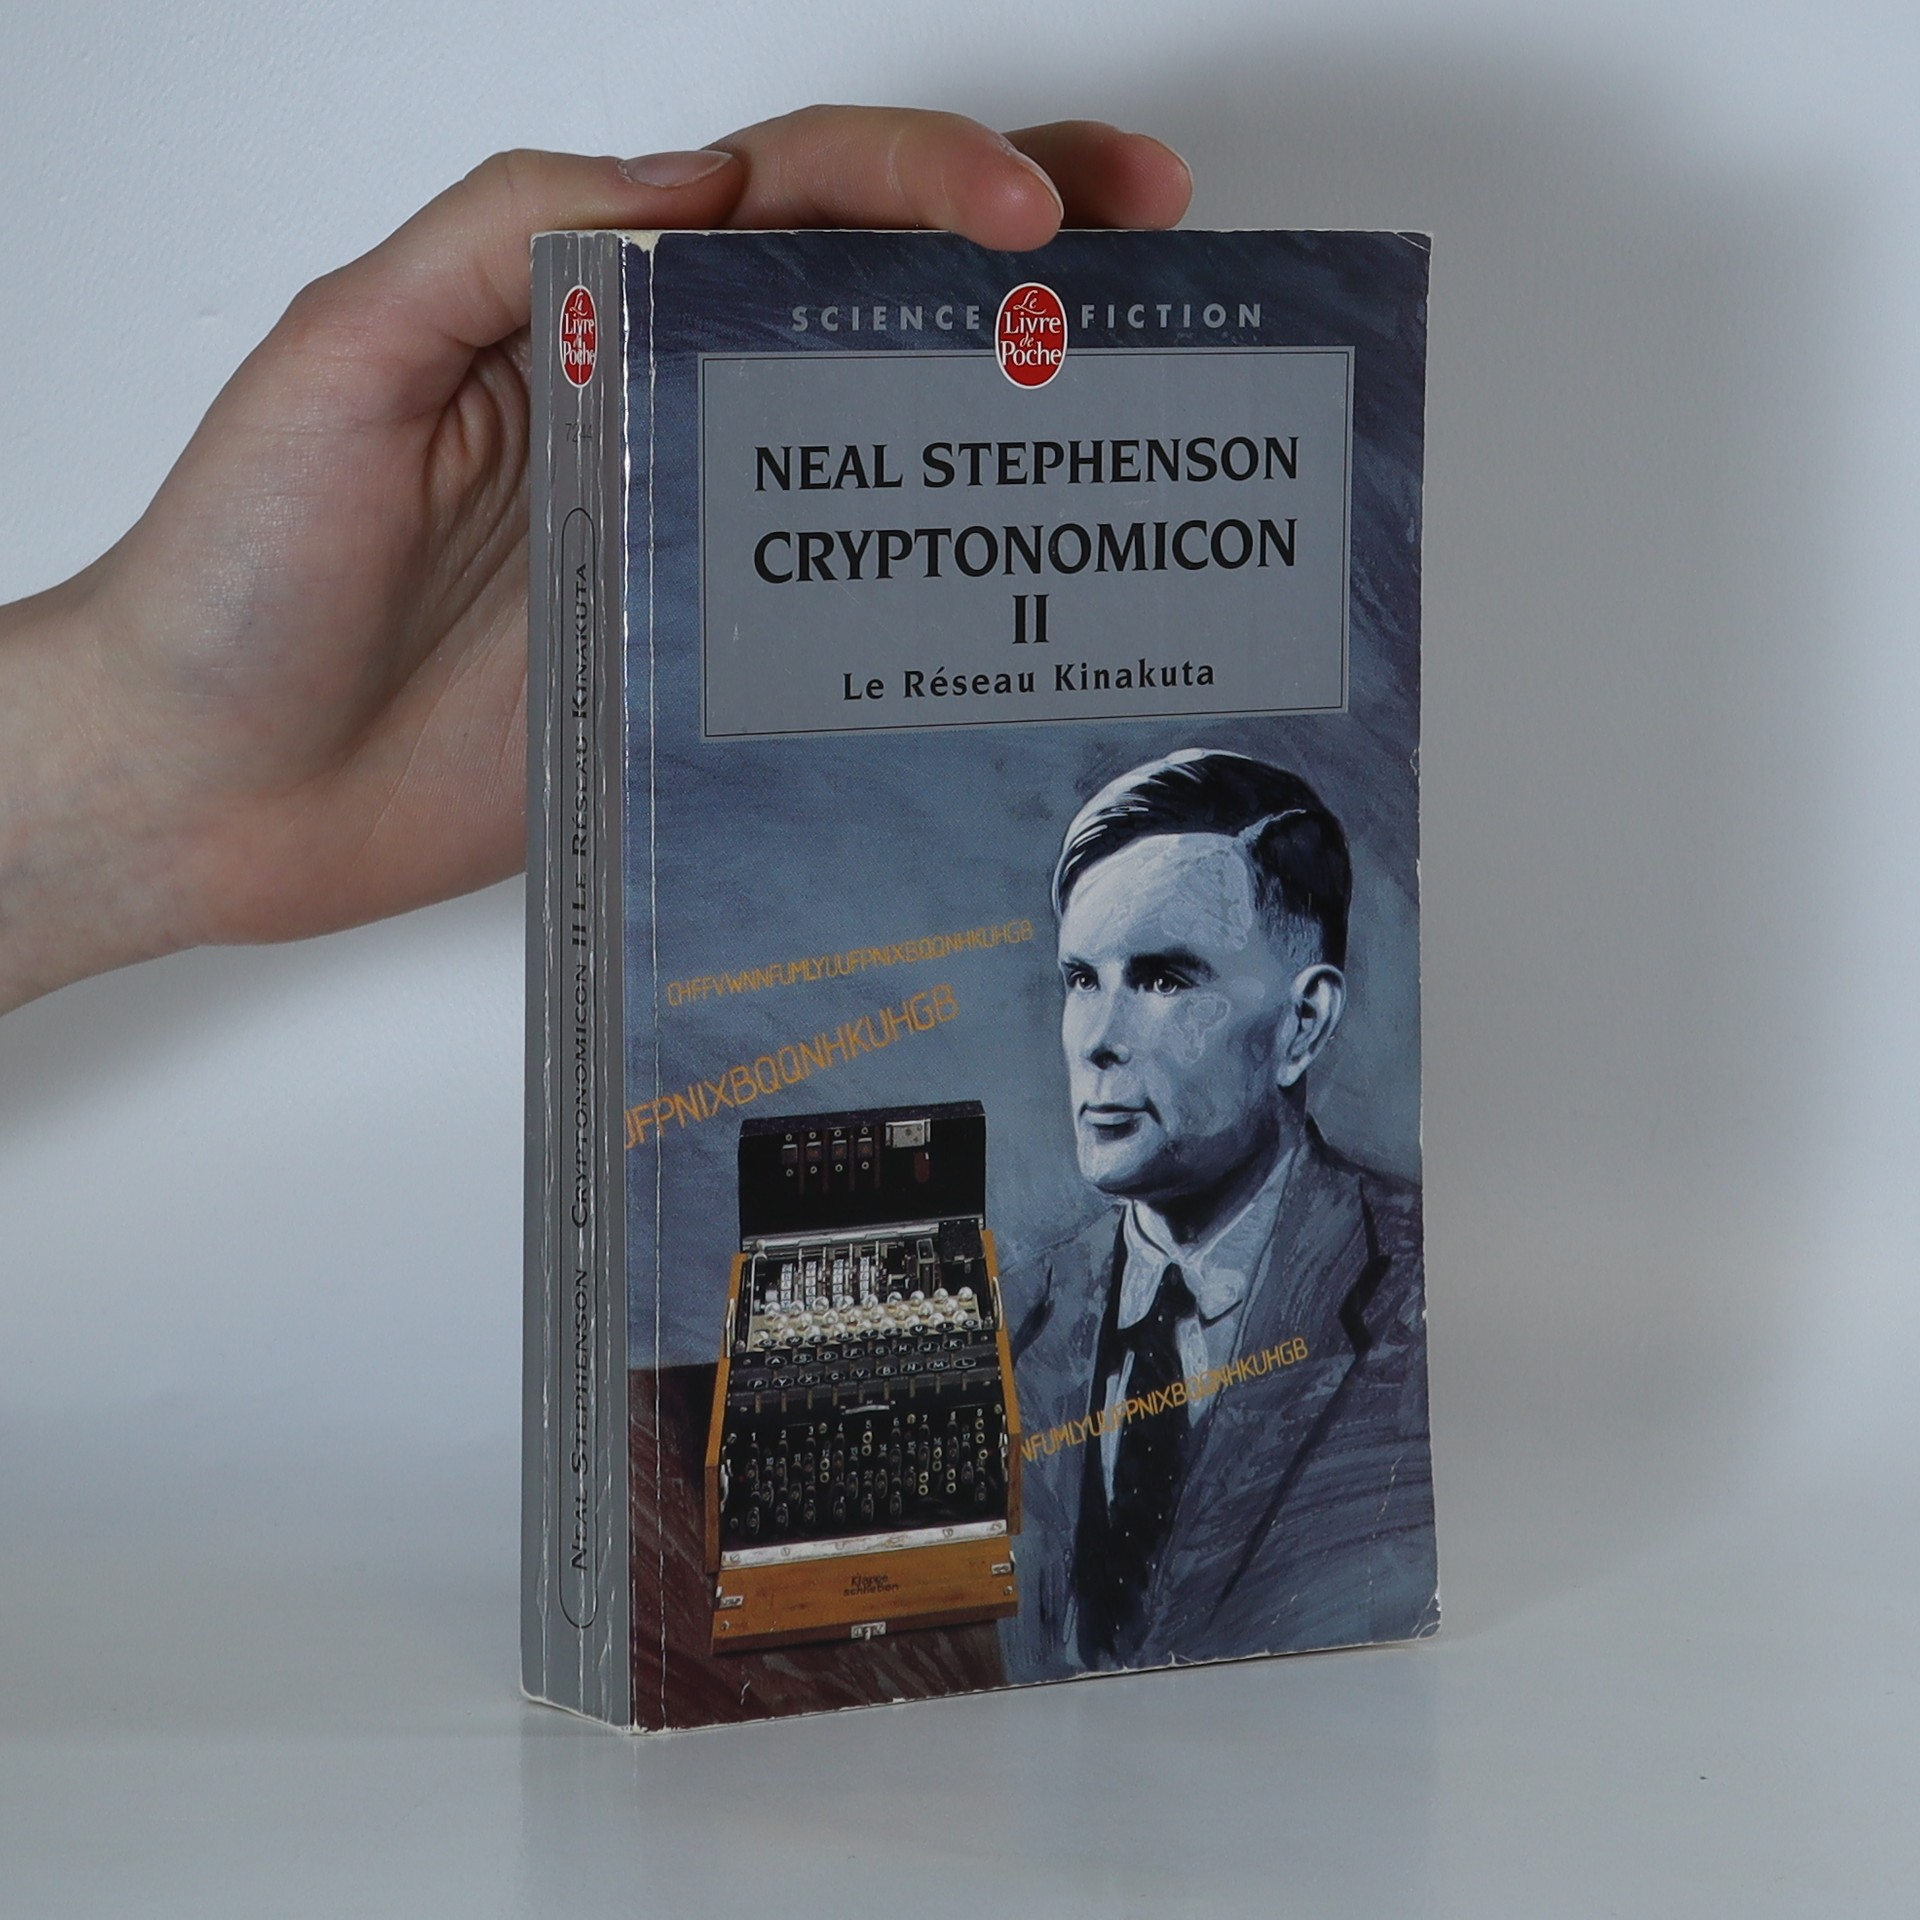 antikvární kniha Le Réseau Kinakuta. Cryptonomicon II, 2005